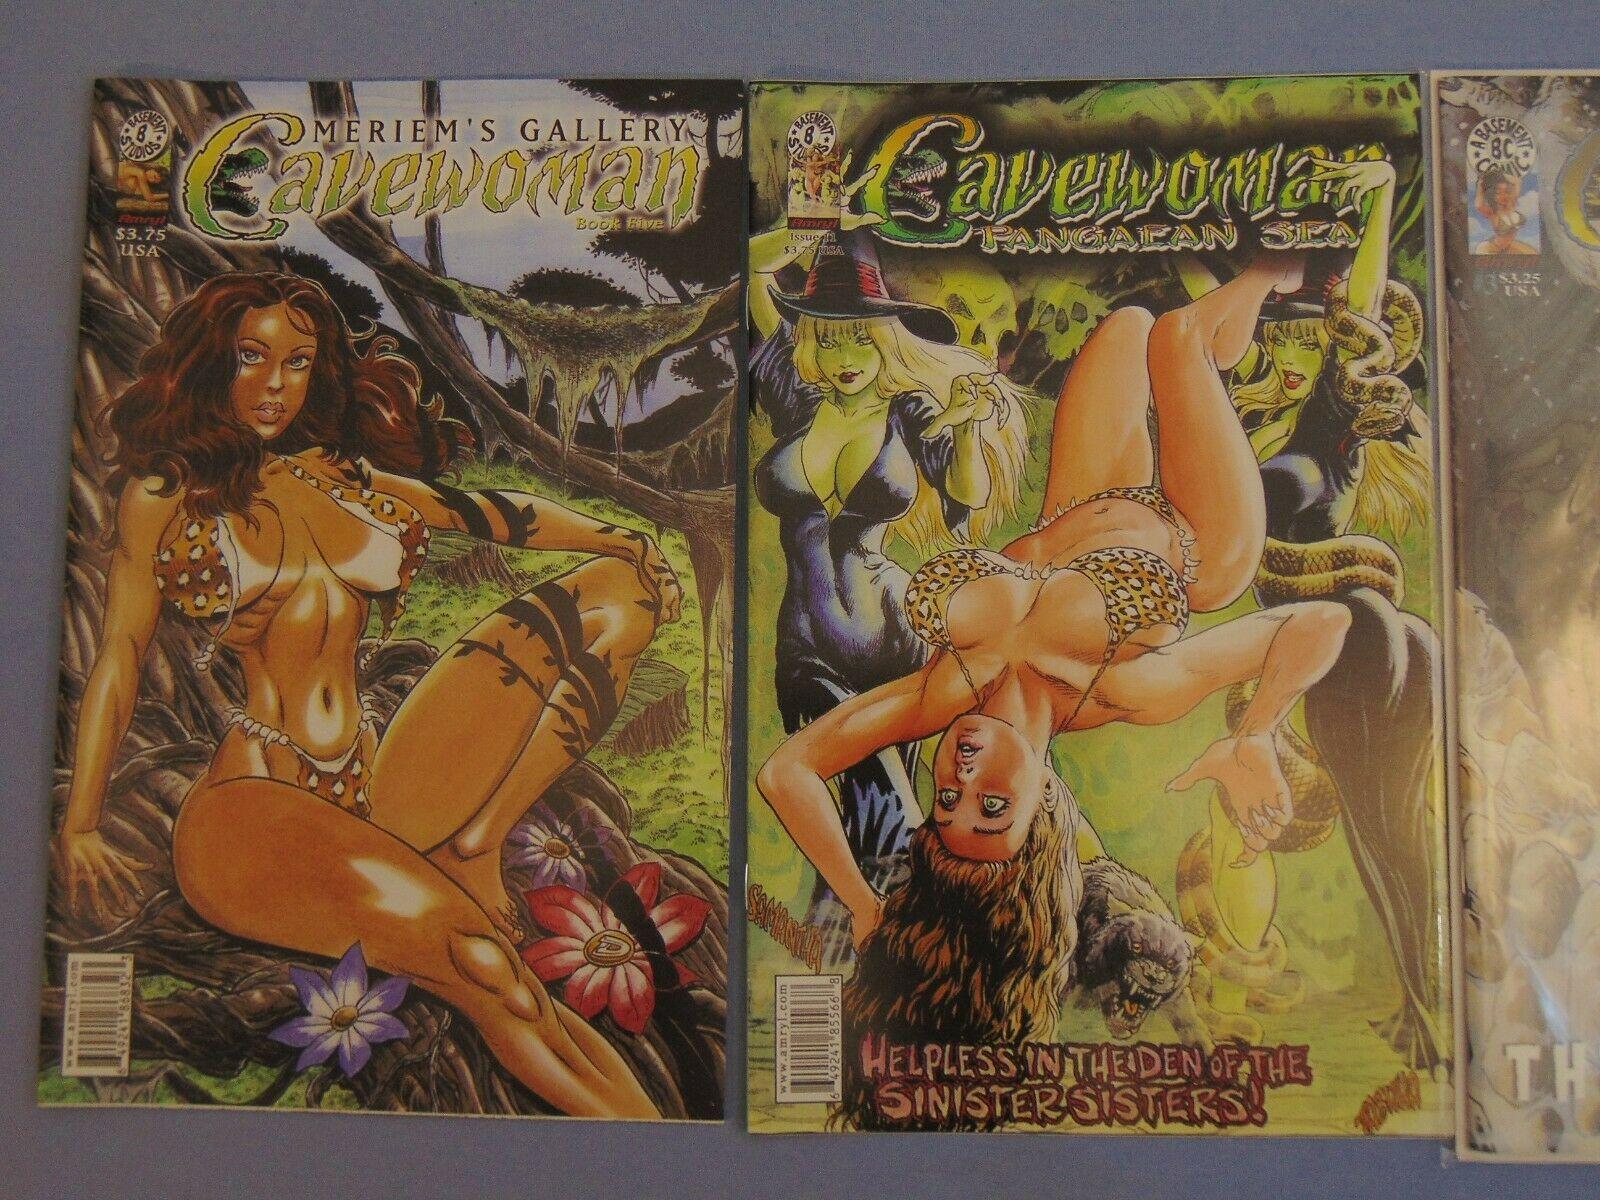 3 Cavewoman Meriem Gallery Basement Studios Amryl Pangaean Sea 1600x1200